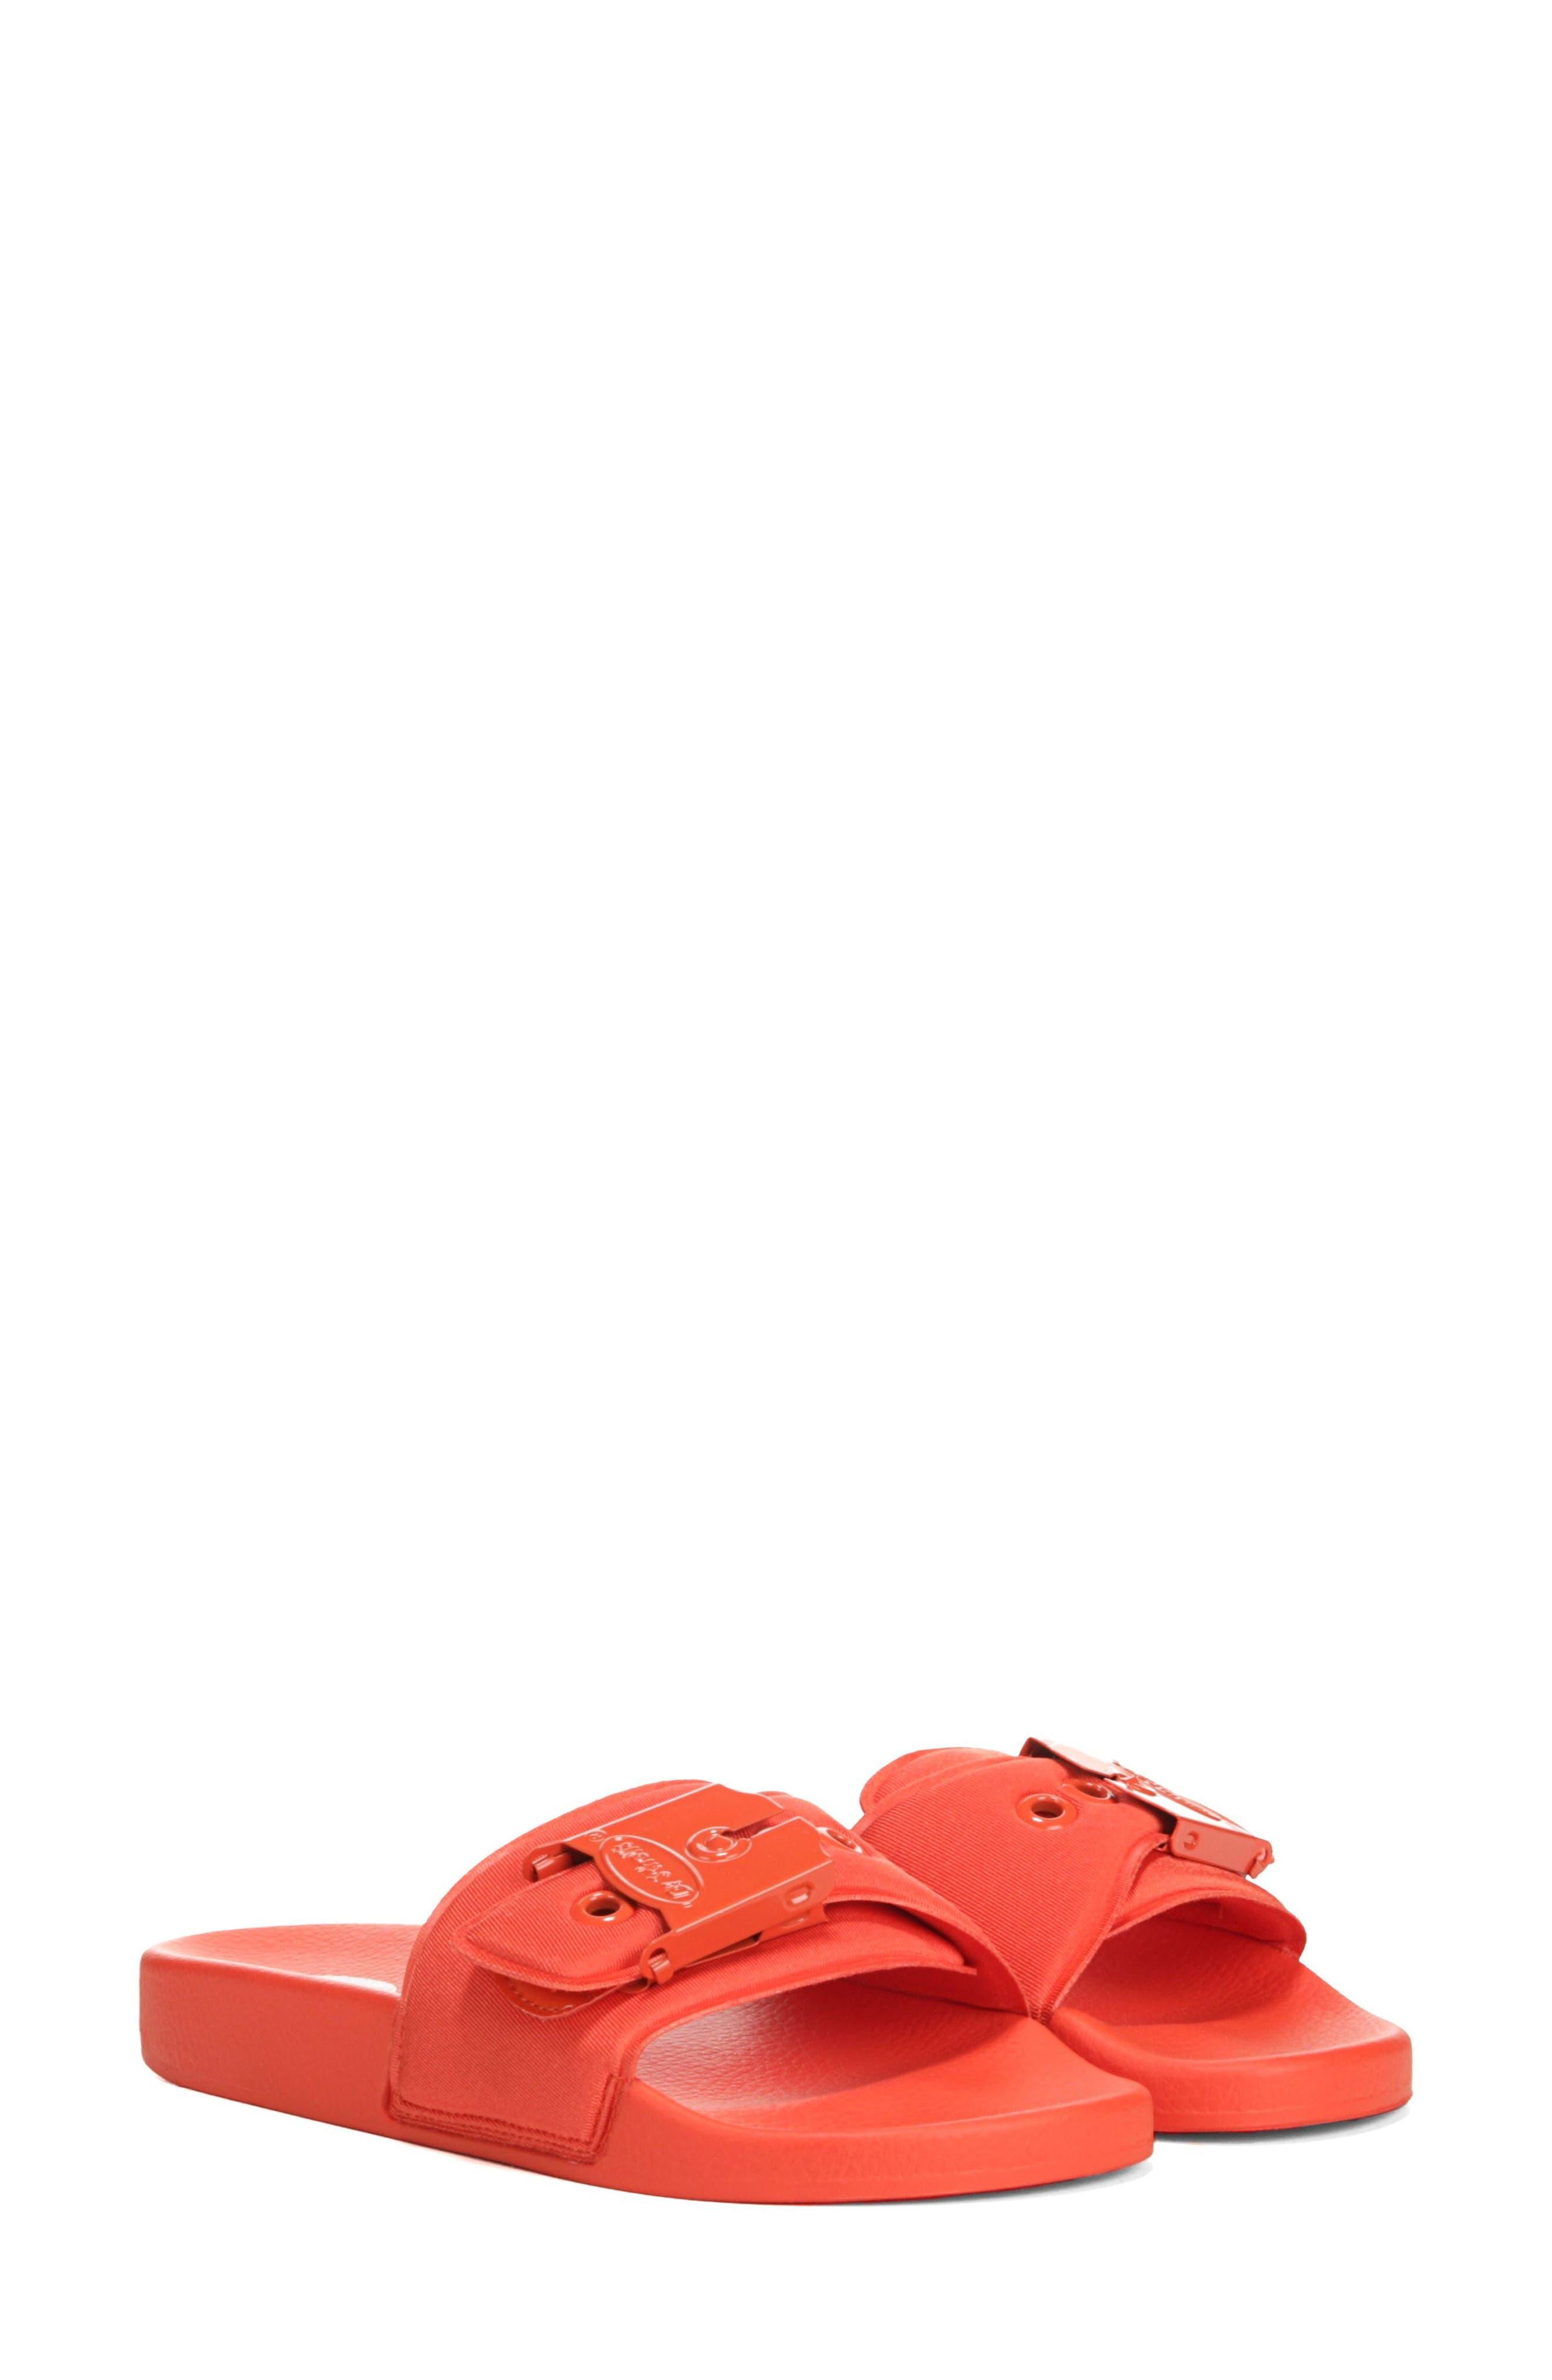 DR. SCHOLL'S, Original Pool Slide Sandal, Main thumbnail 1, color, TIGER LILY